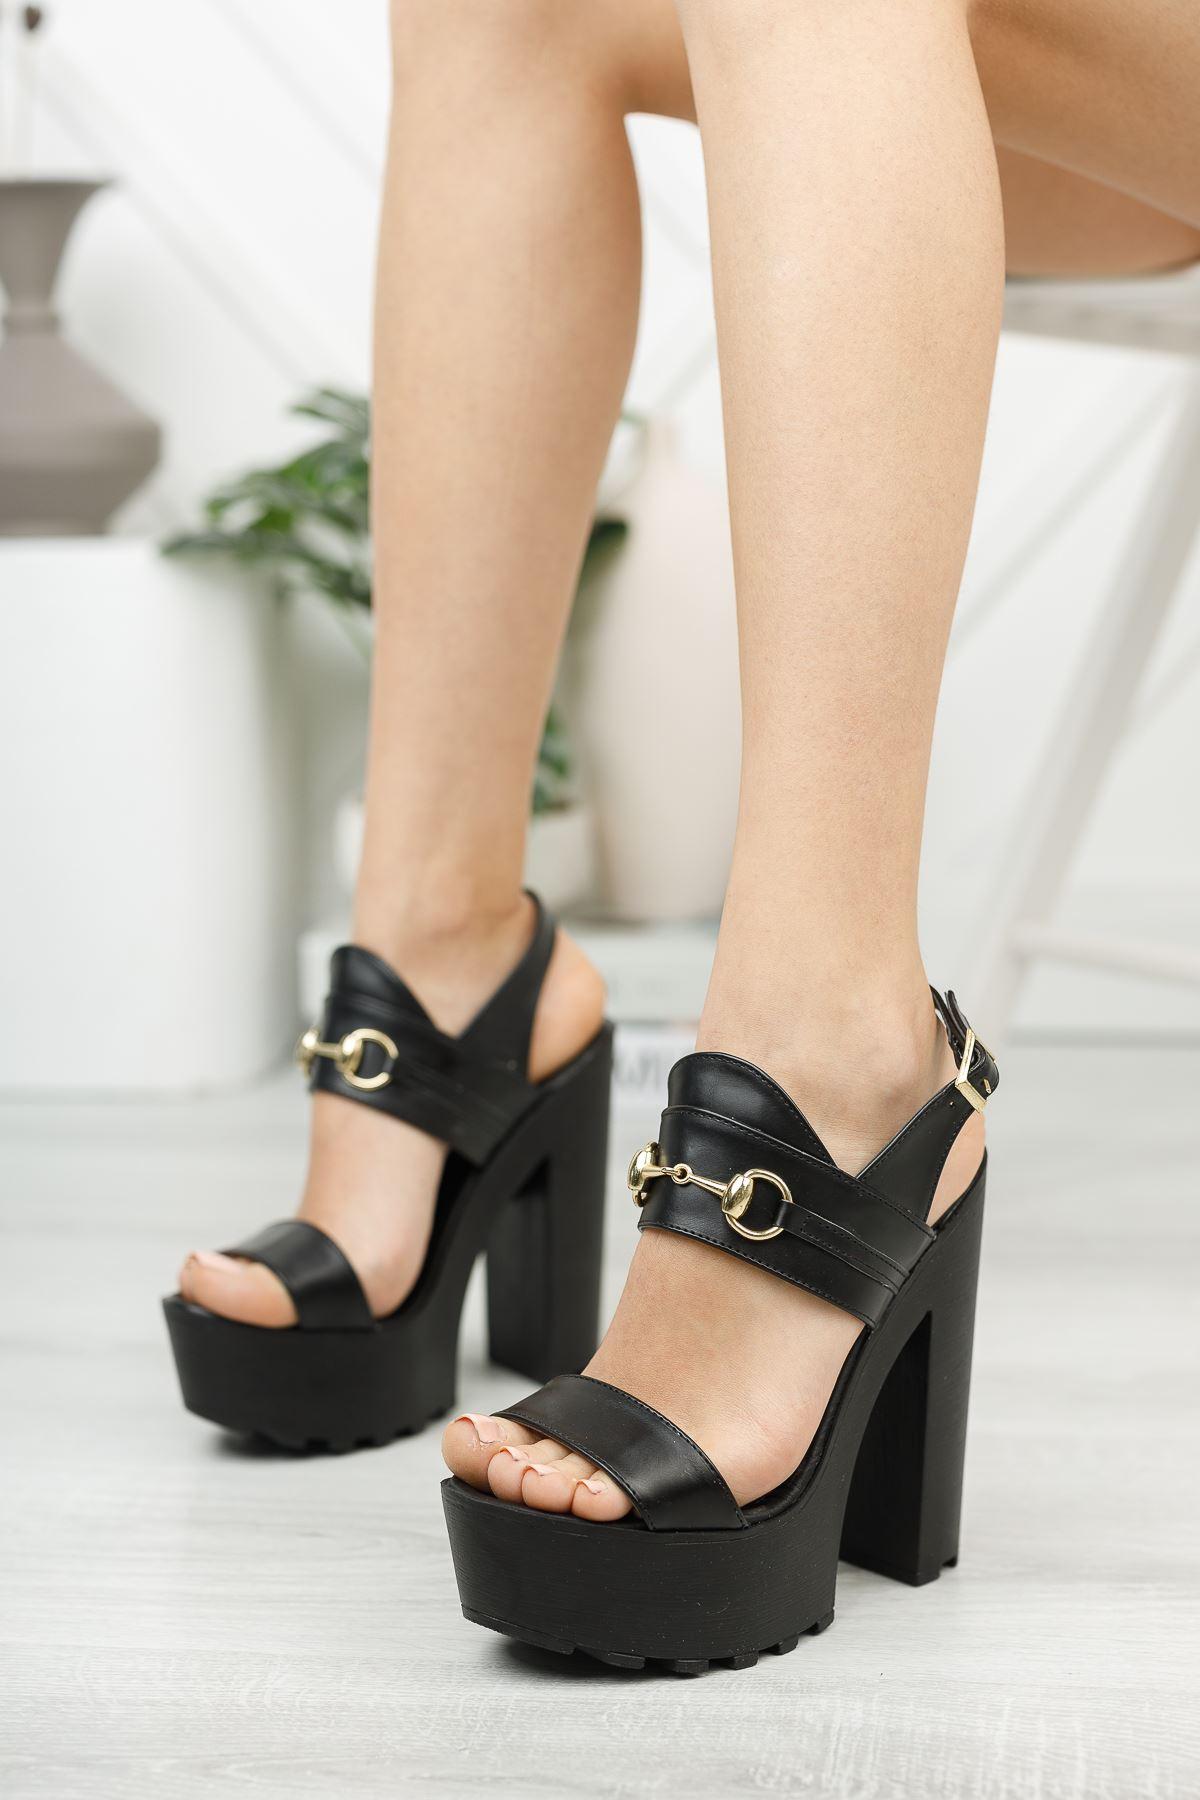 Siyah Yüksek Platform Topuklu Ayakkabı